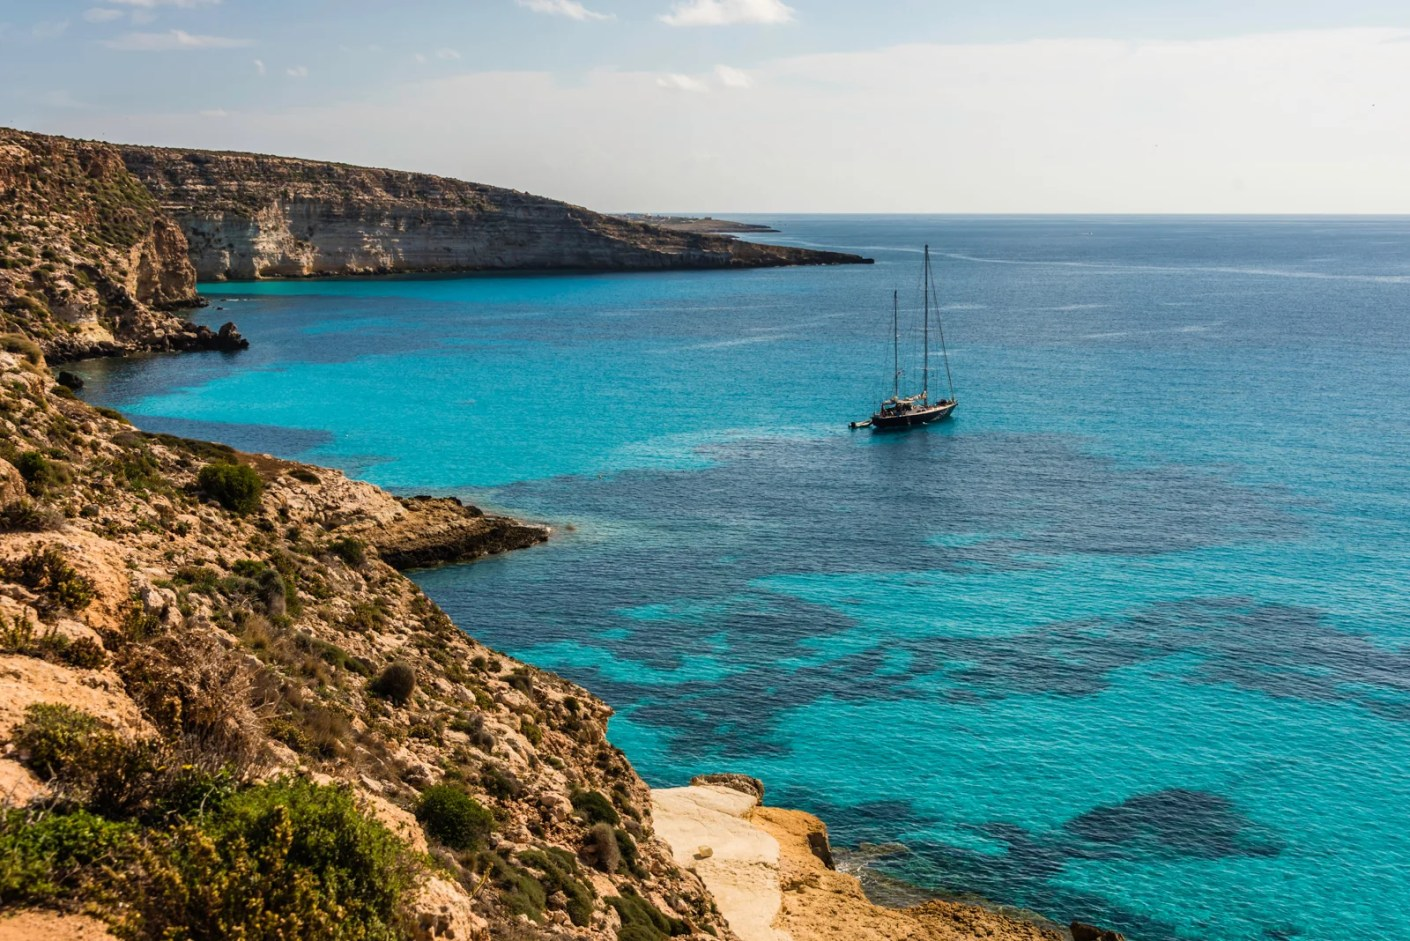 Rabbit Beach in Lampedusa, Pelagie Islands. (Photo by Vansky / Shutterstock)